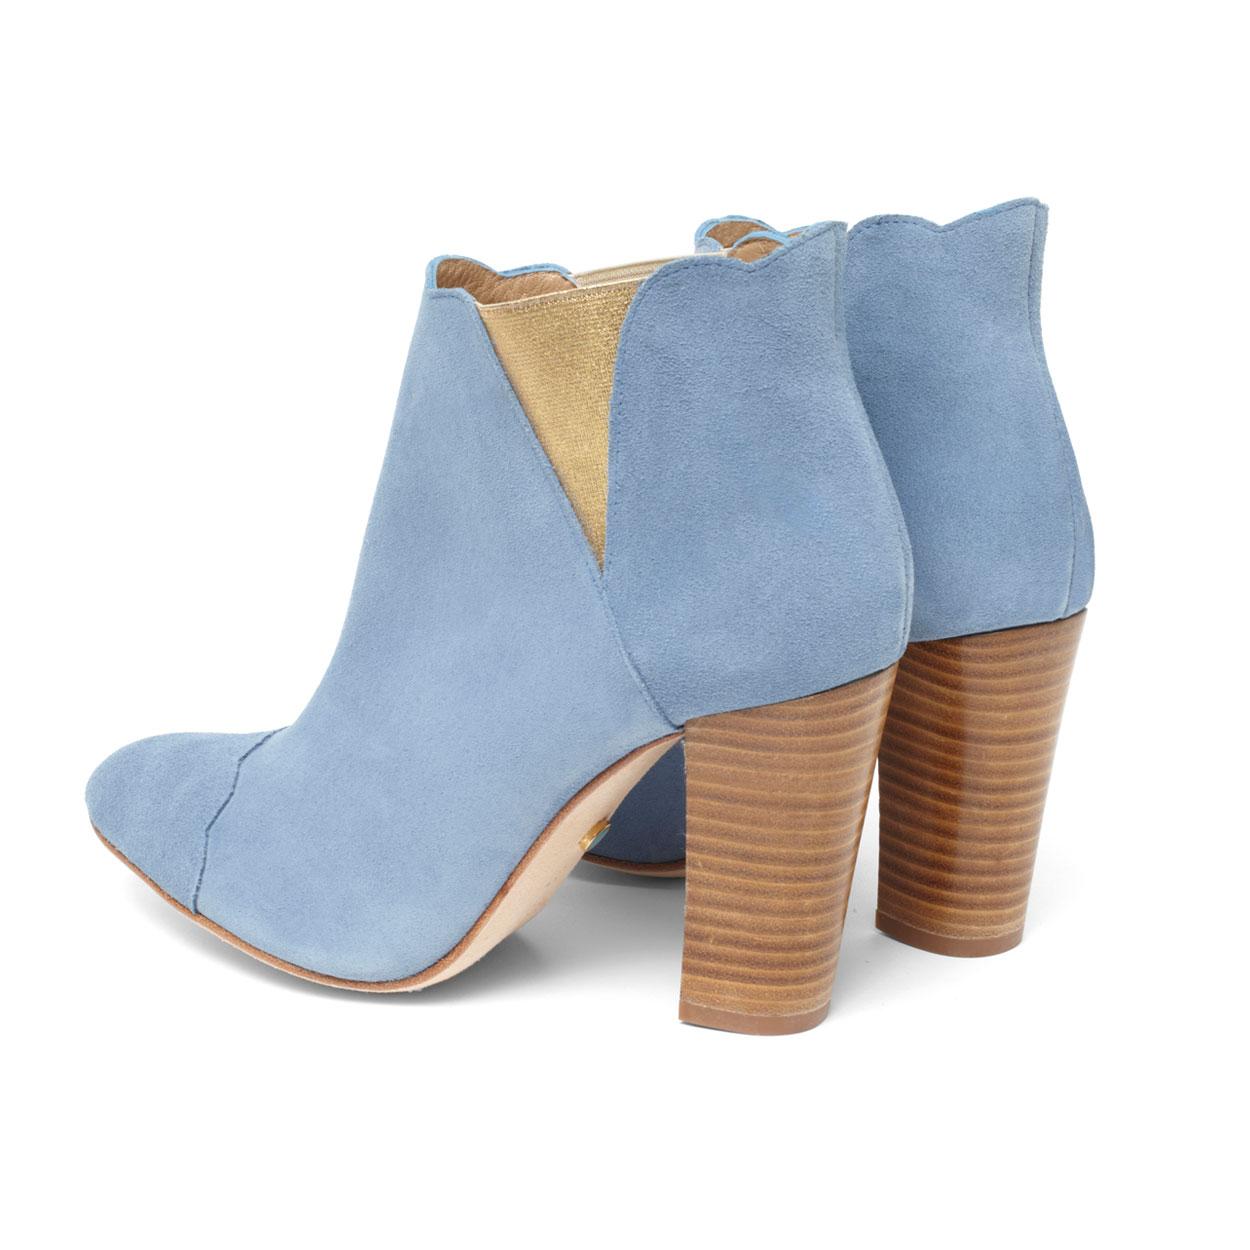 puff-blue-pair-back-shoes-shoe-designer-cleob-luxury-shopping-london.jpg